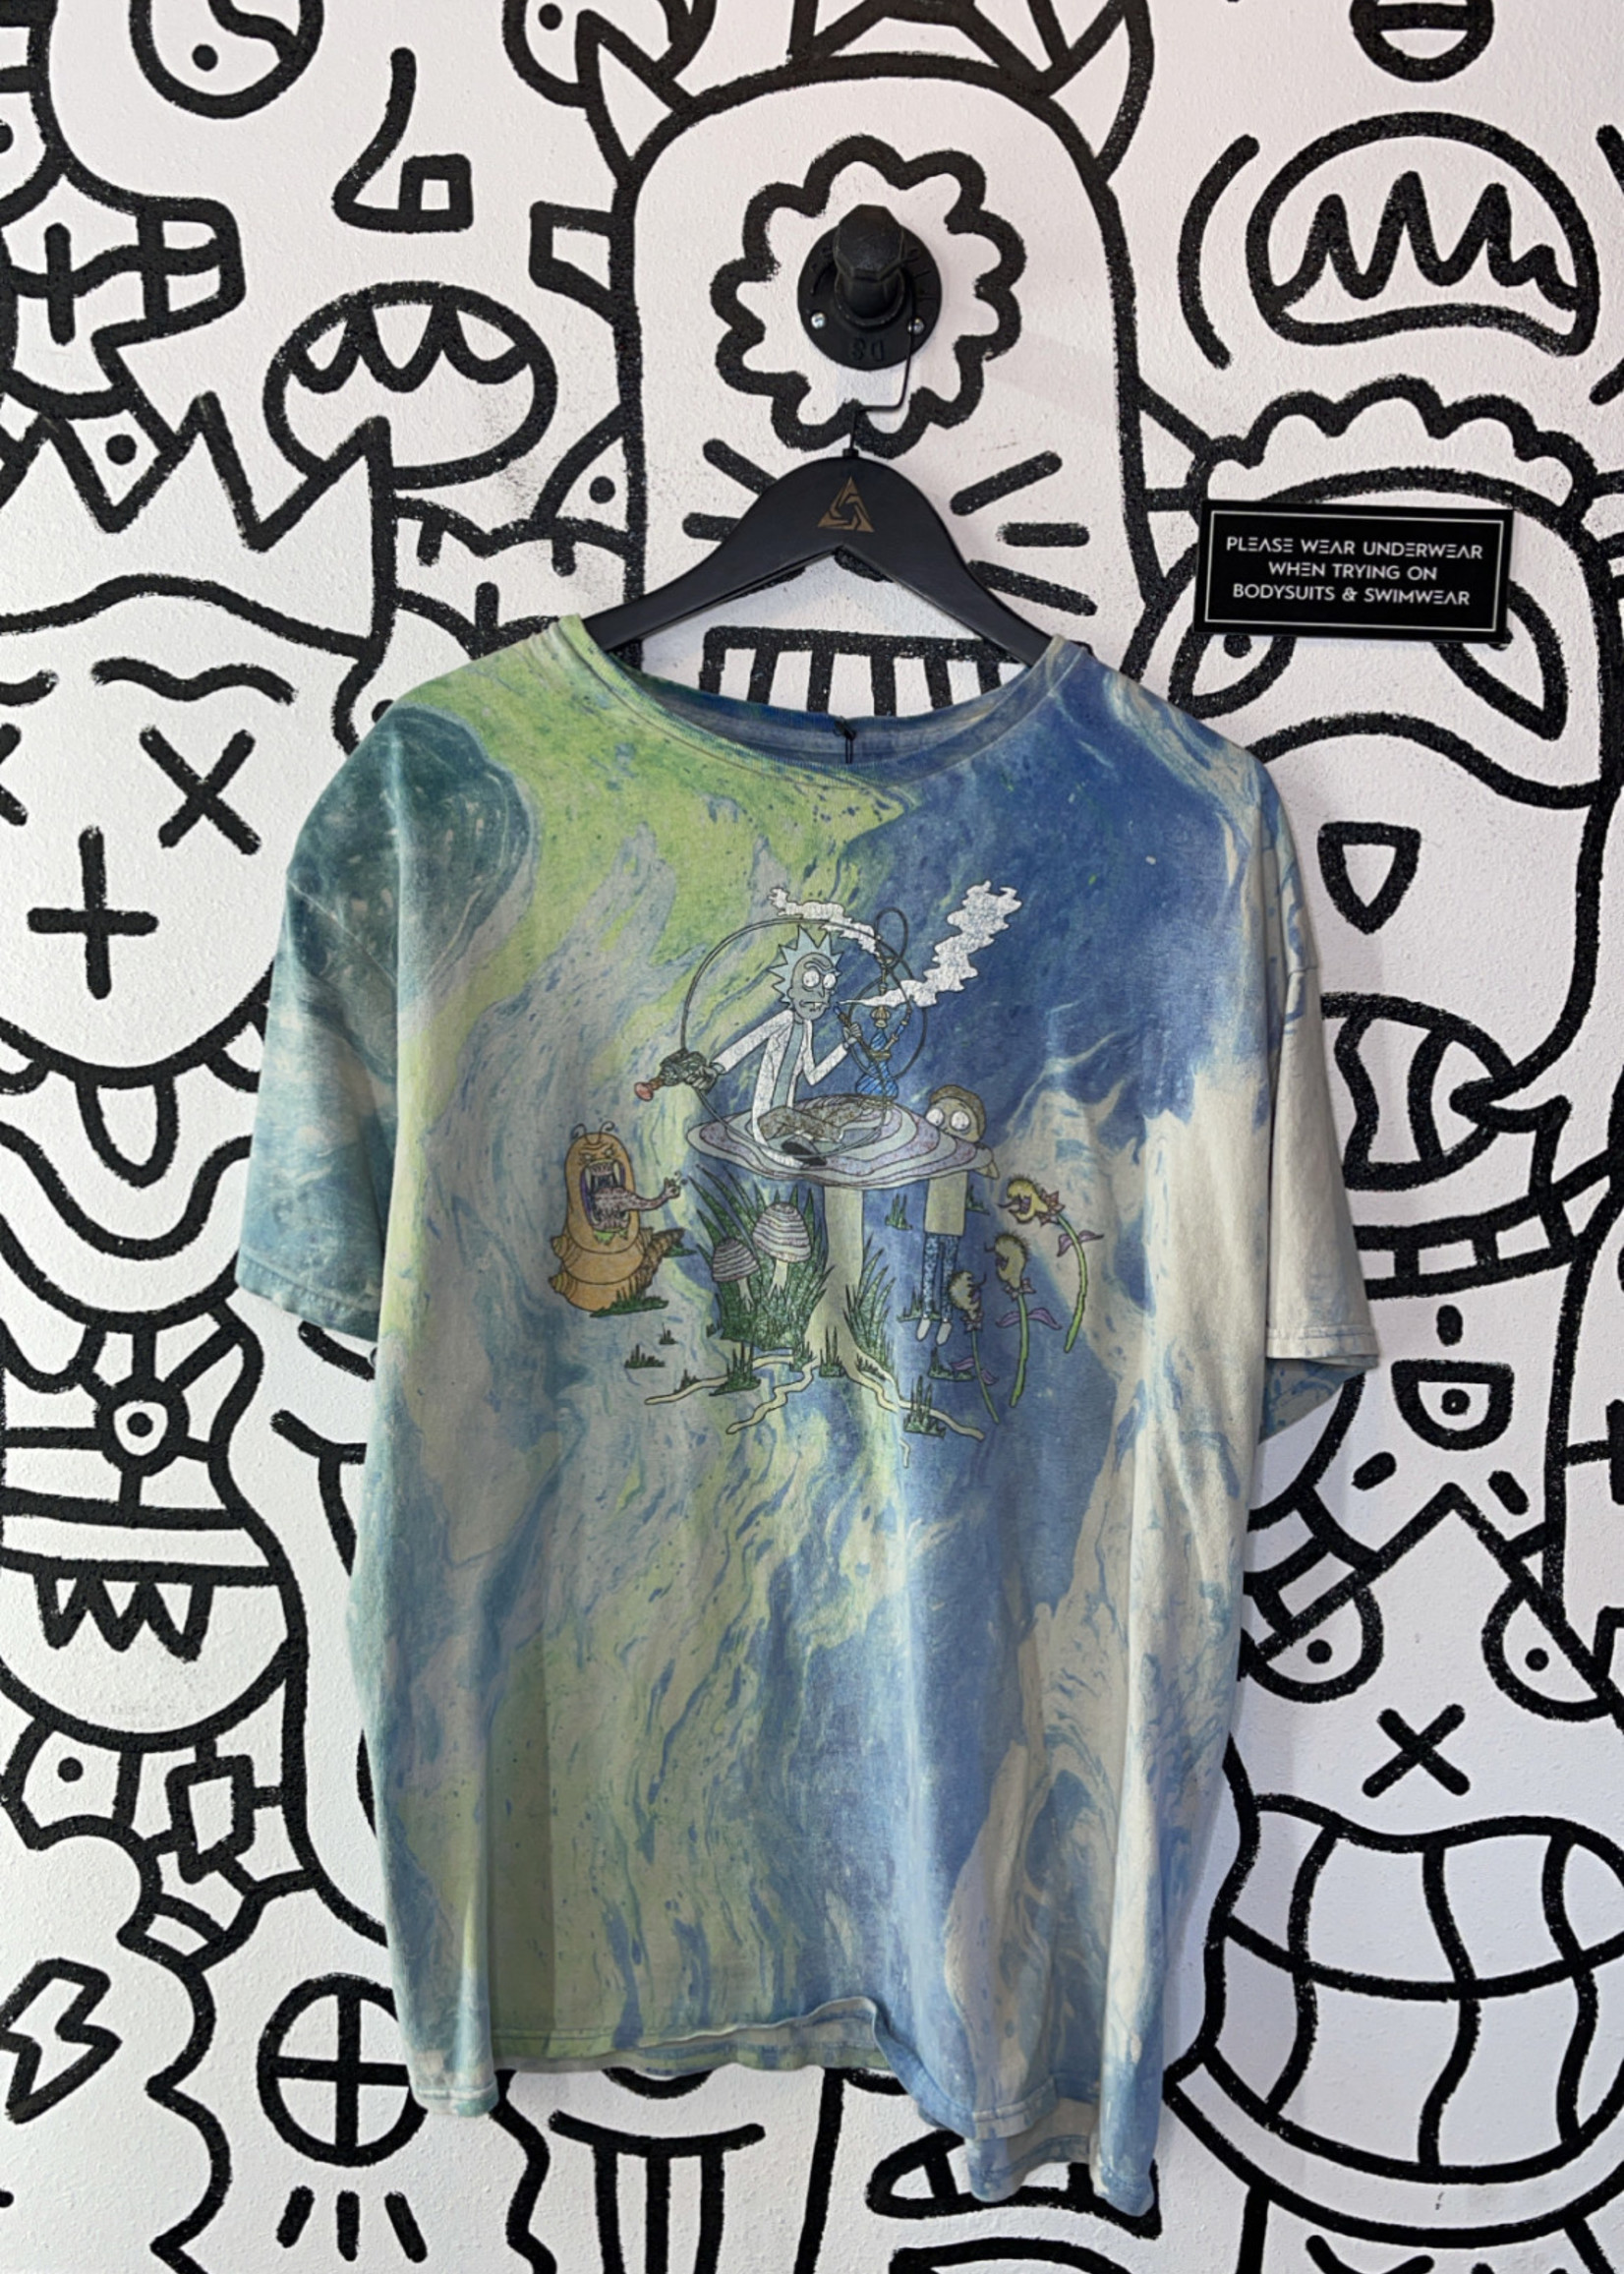 Rick and morty grahic tye die t shirt XL